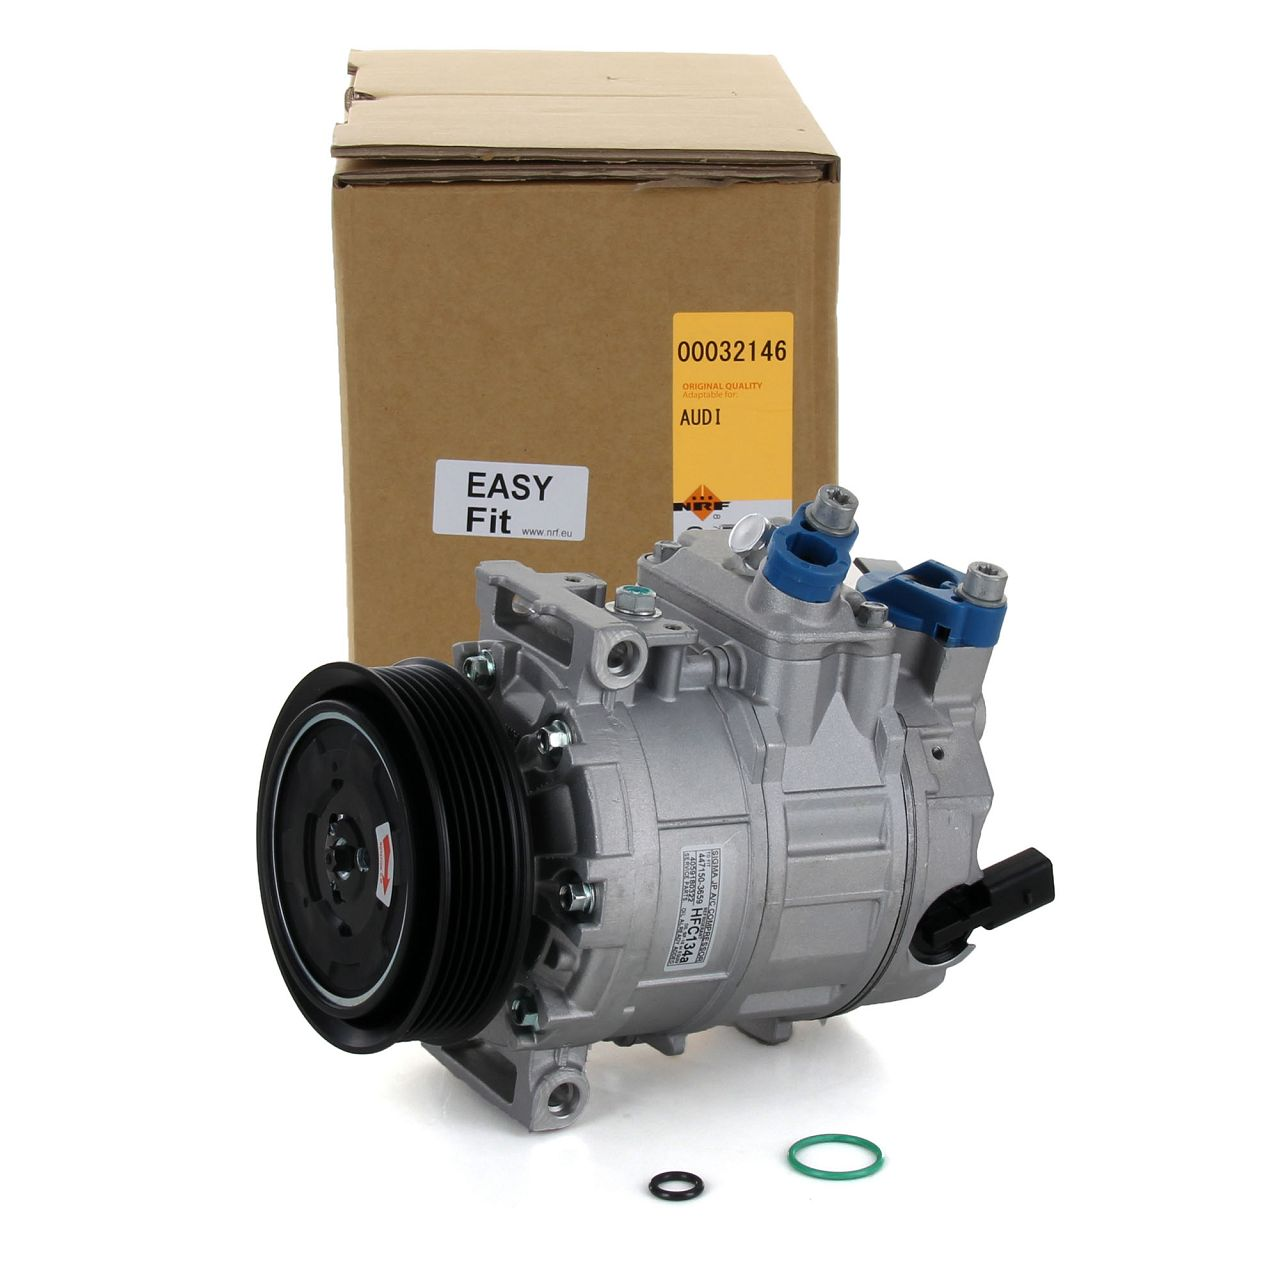 NRF 32146 Kompressor Klimakompressor Klimaanlage EASY FIT für AUDI SEAT SKODA VW